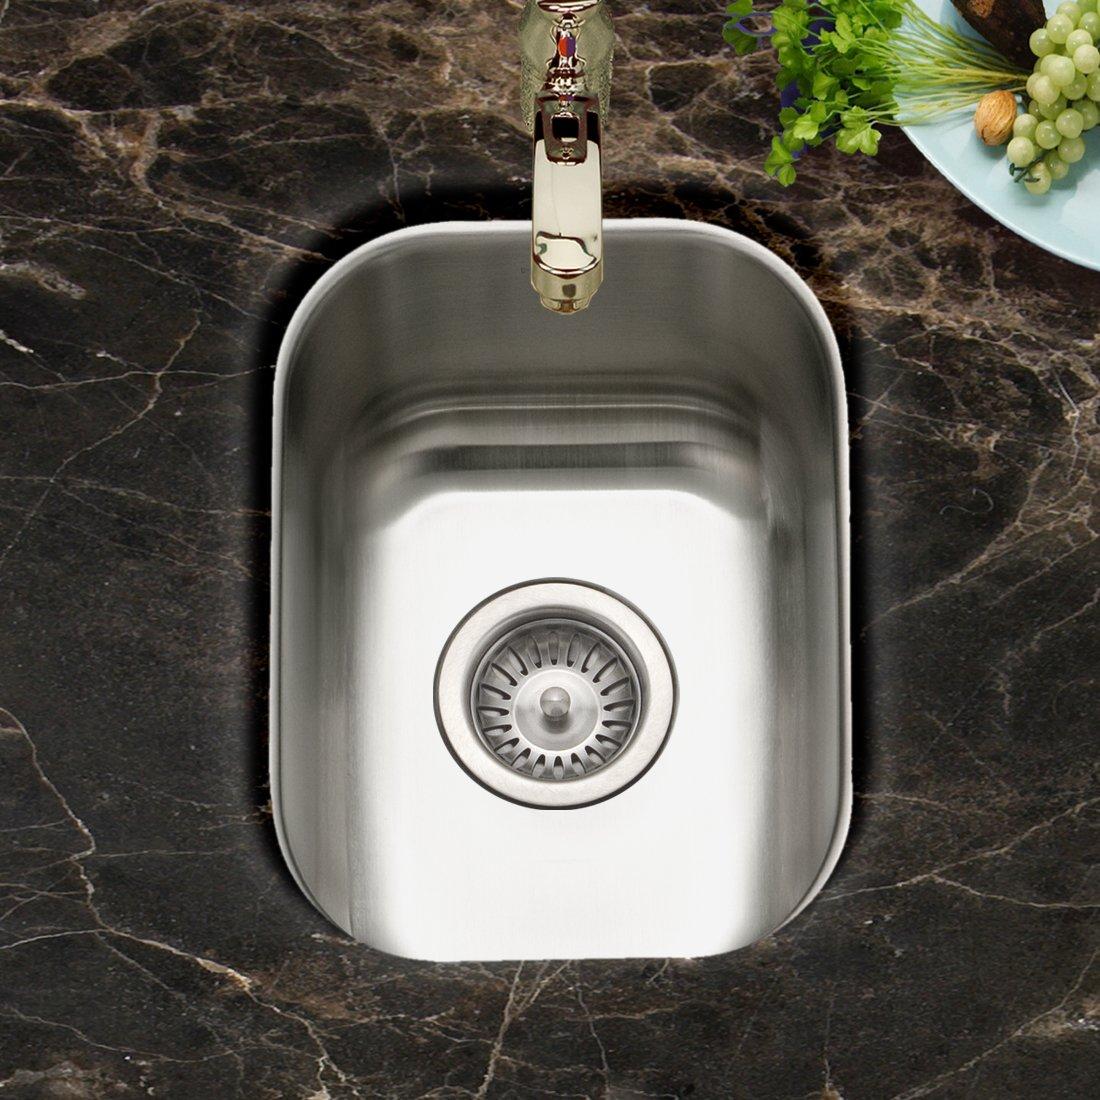 Houzer CS 1307 1 Club Series Undermount Small Bar/ Prep Sink   Sink  Strainers   Amazon.com